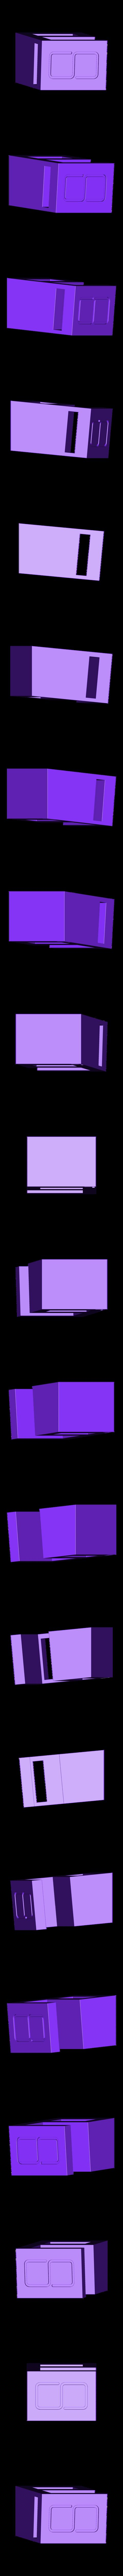 Left.stl Download free STL file SixxiS • 3D printer object, Eicca7